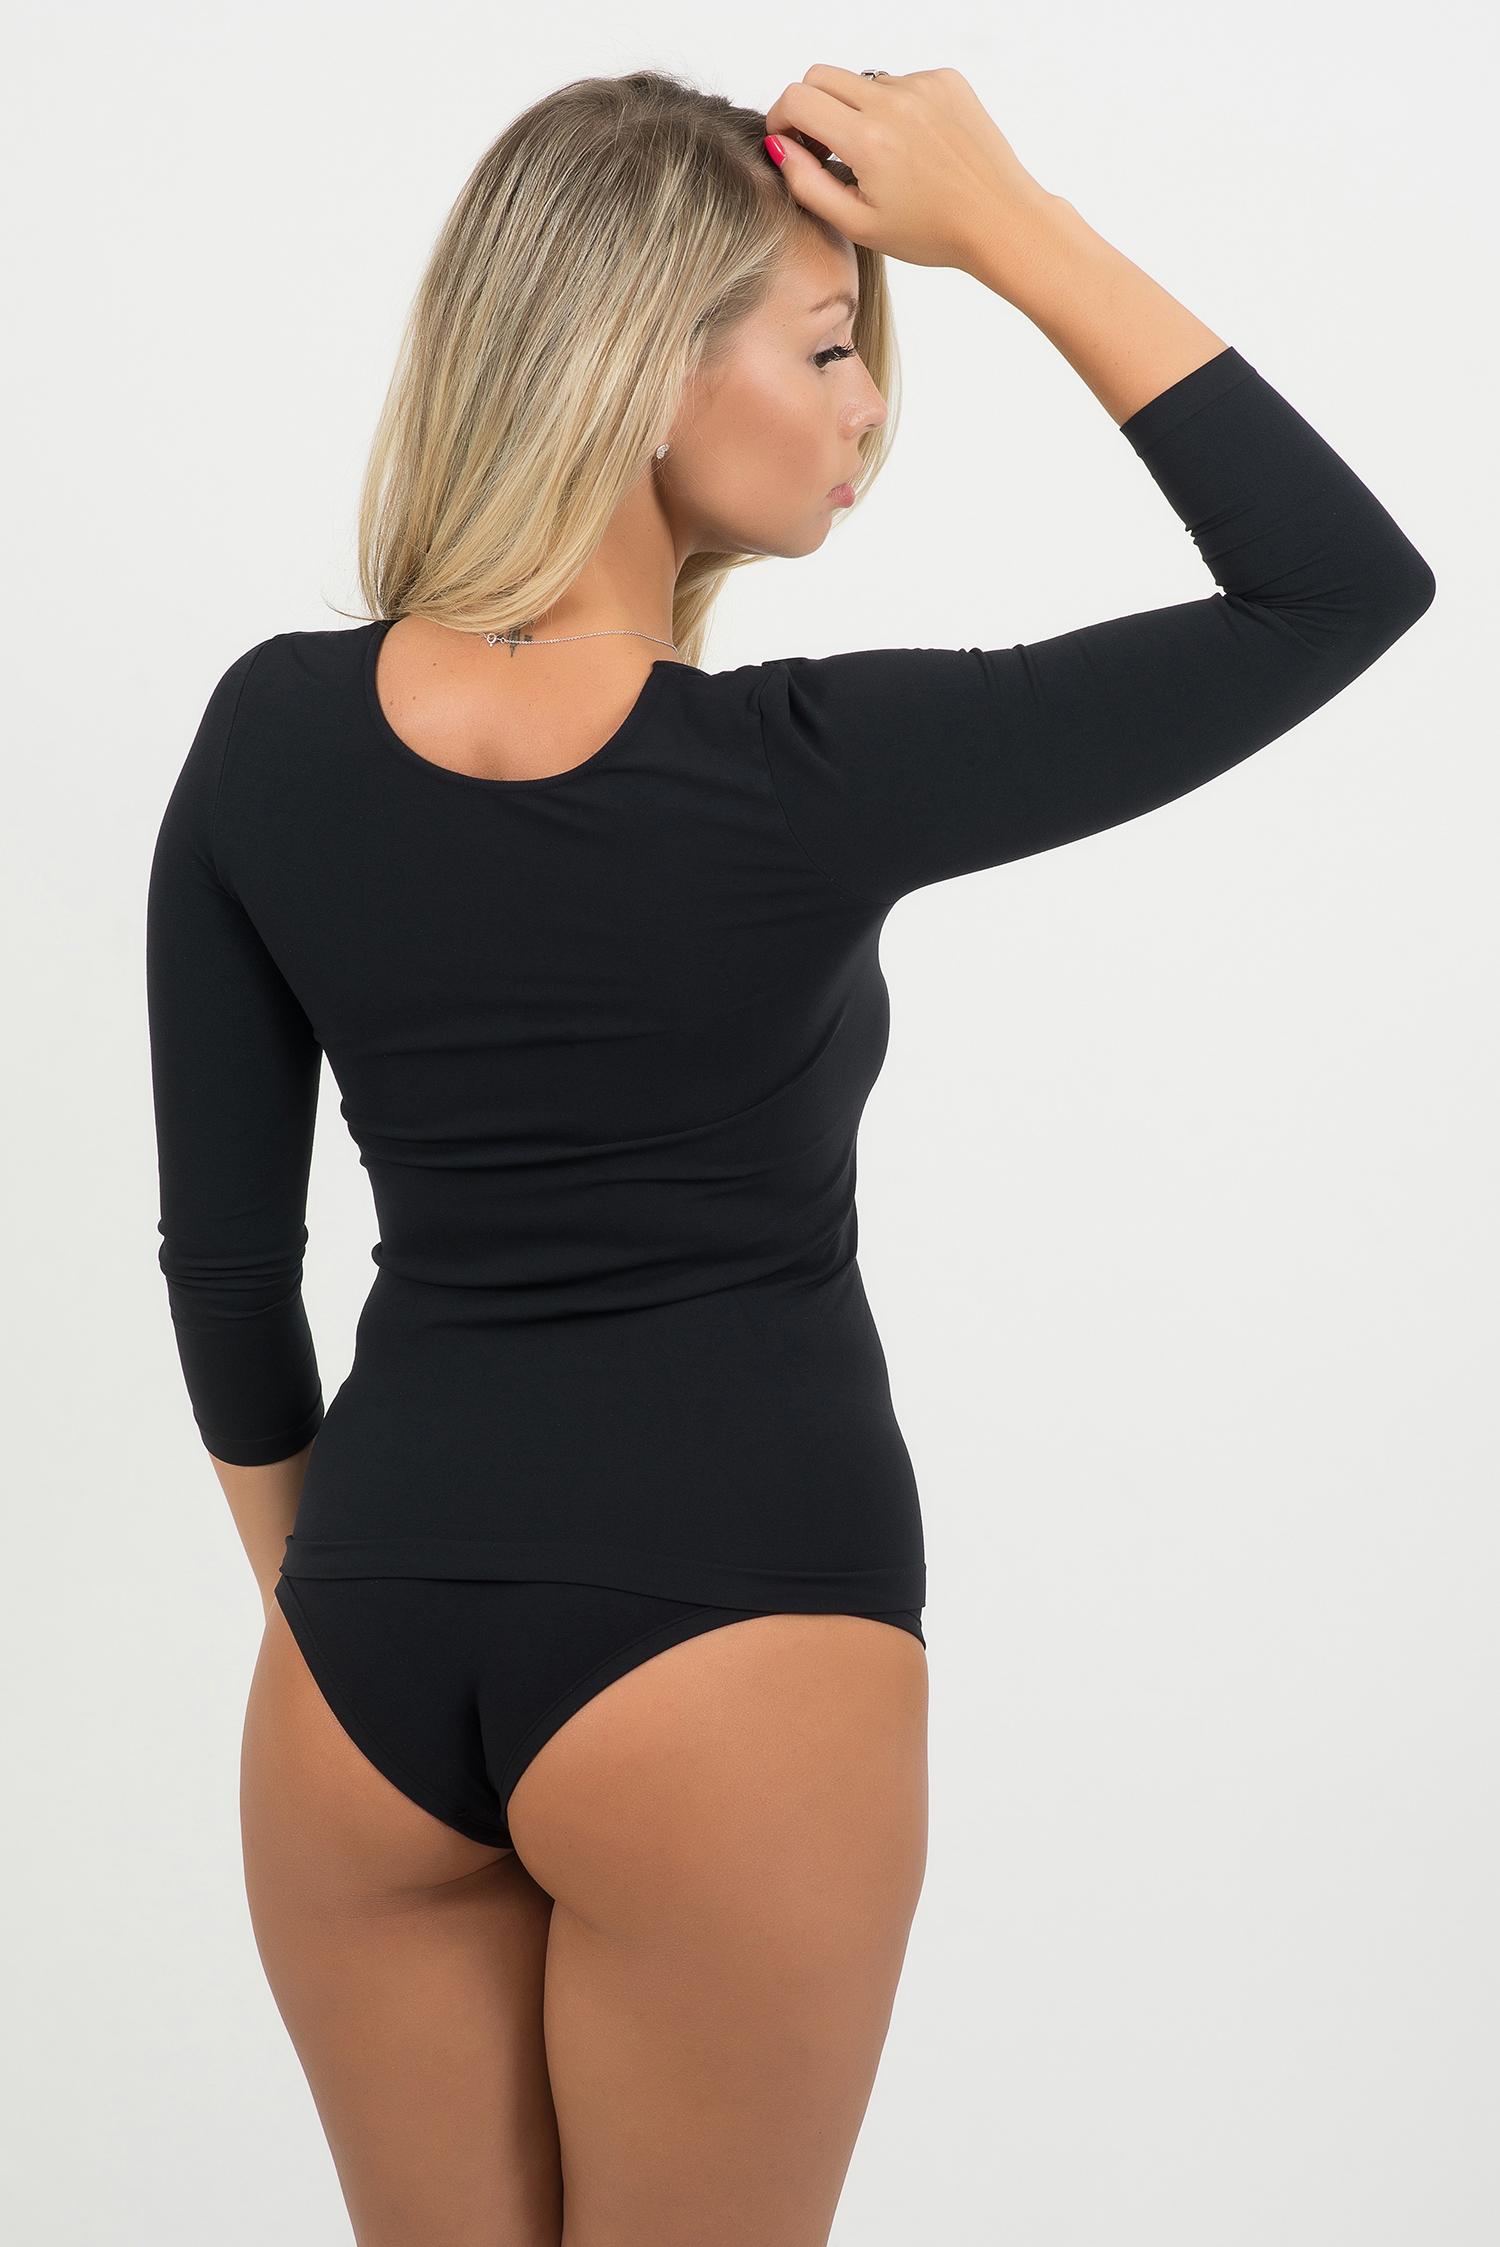 Bellissima-Women-039-s-3-4-Sleeve-Scoop-Neck-T-Shirt-Seamless-Stretch-Basic-Top thumbnail 13